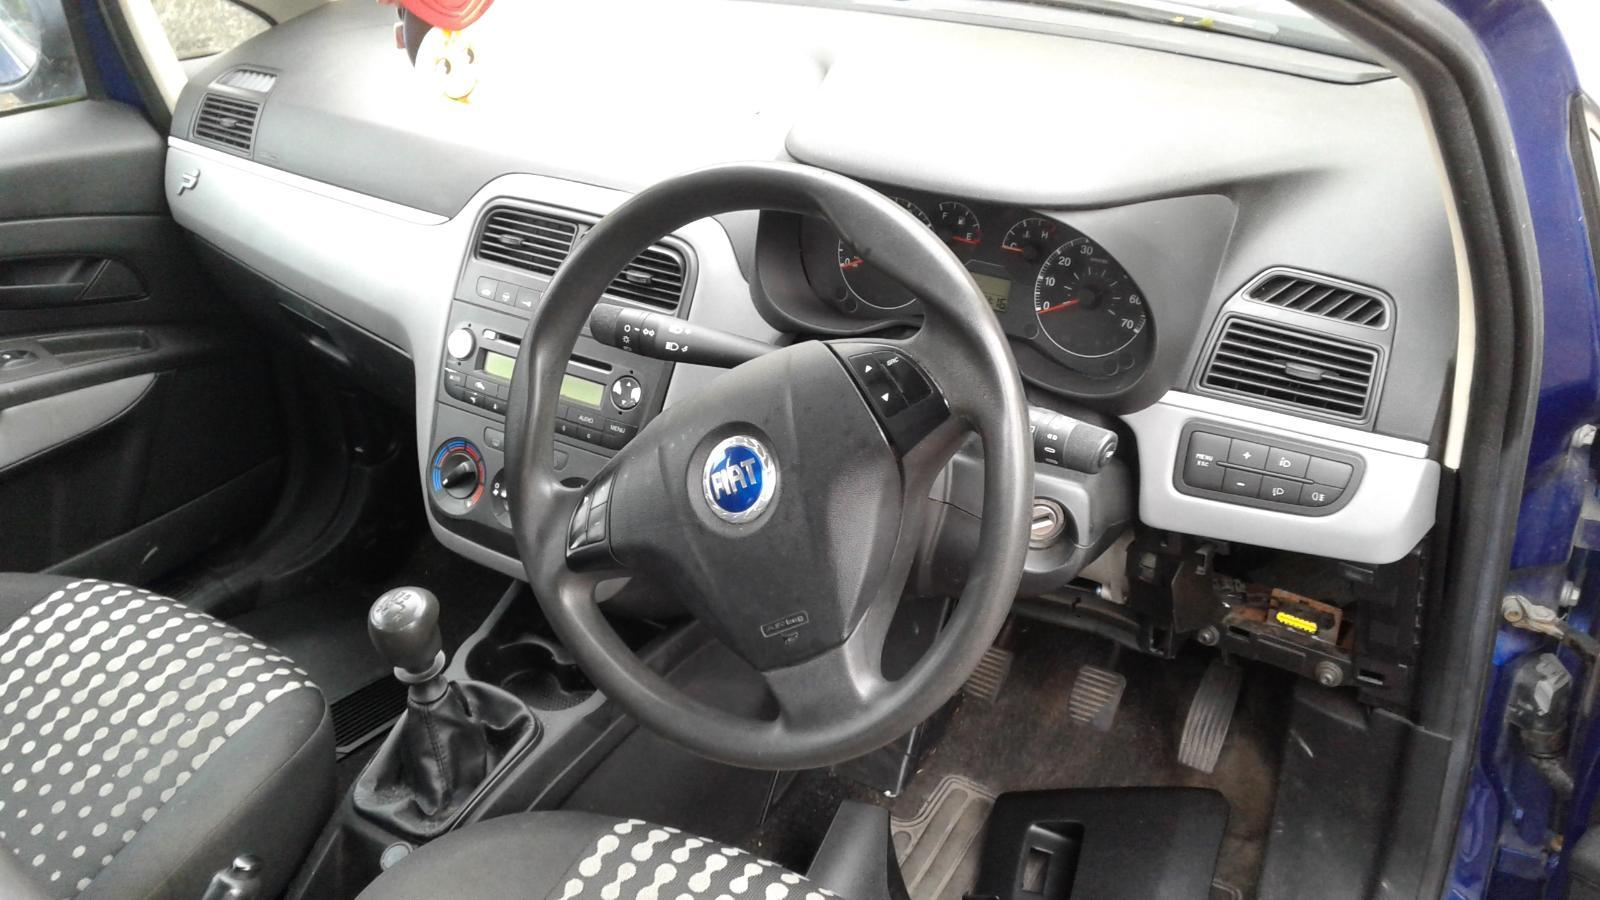 2006 FIAT GRANDE PUNTO Image